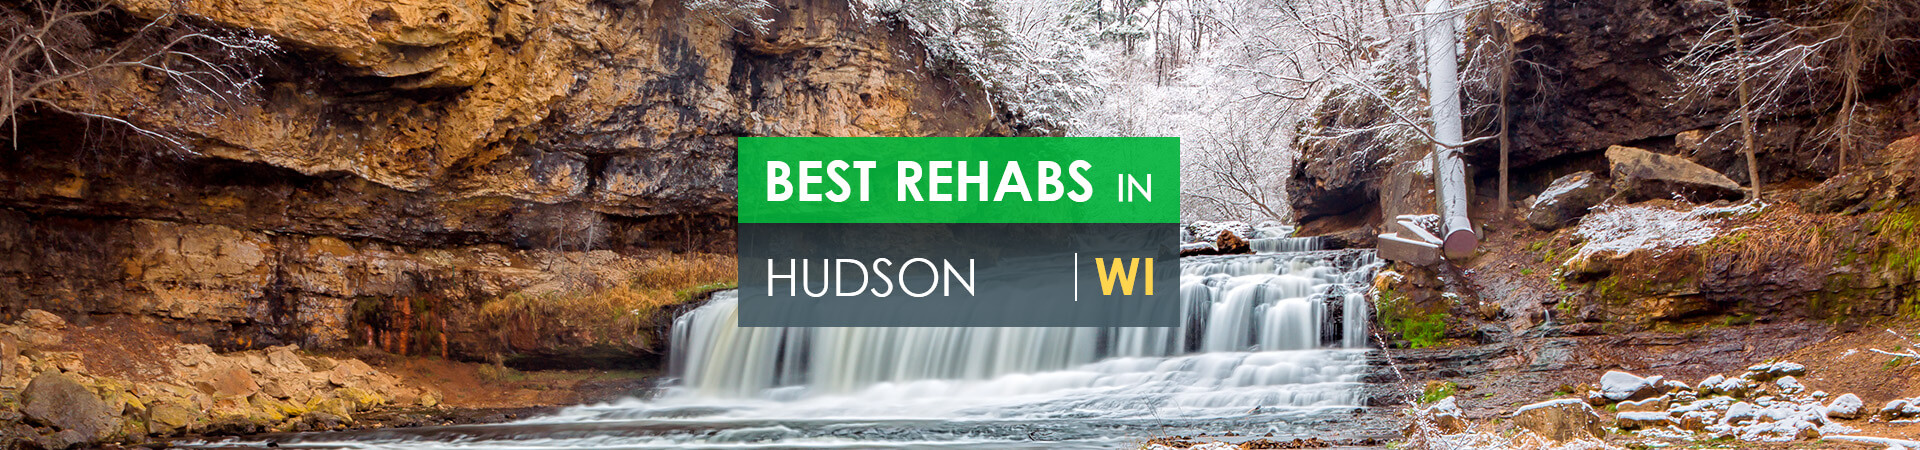 Best rehabs in Hudson, WI